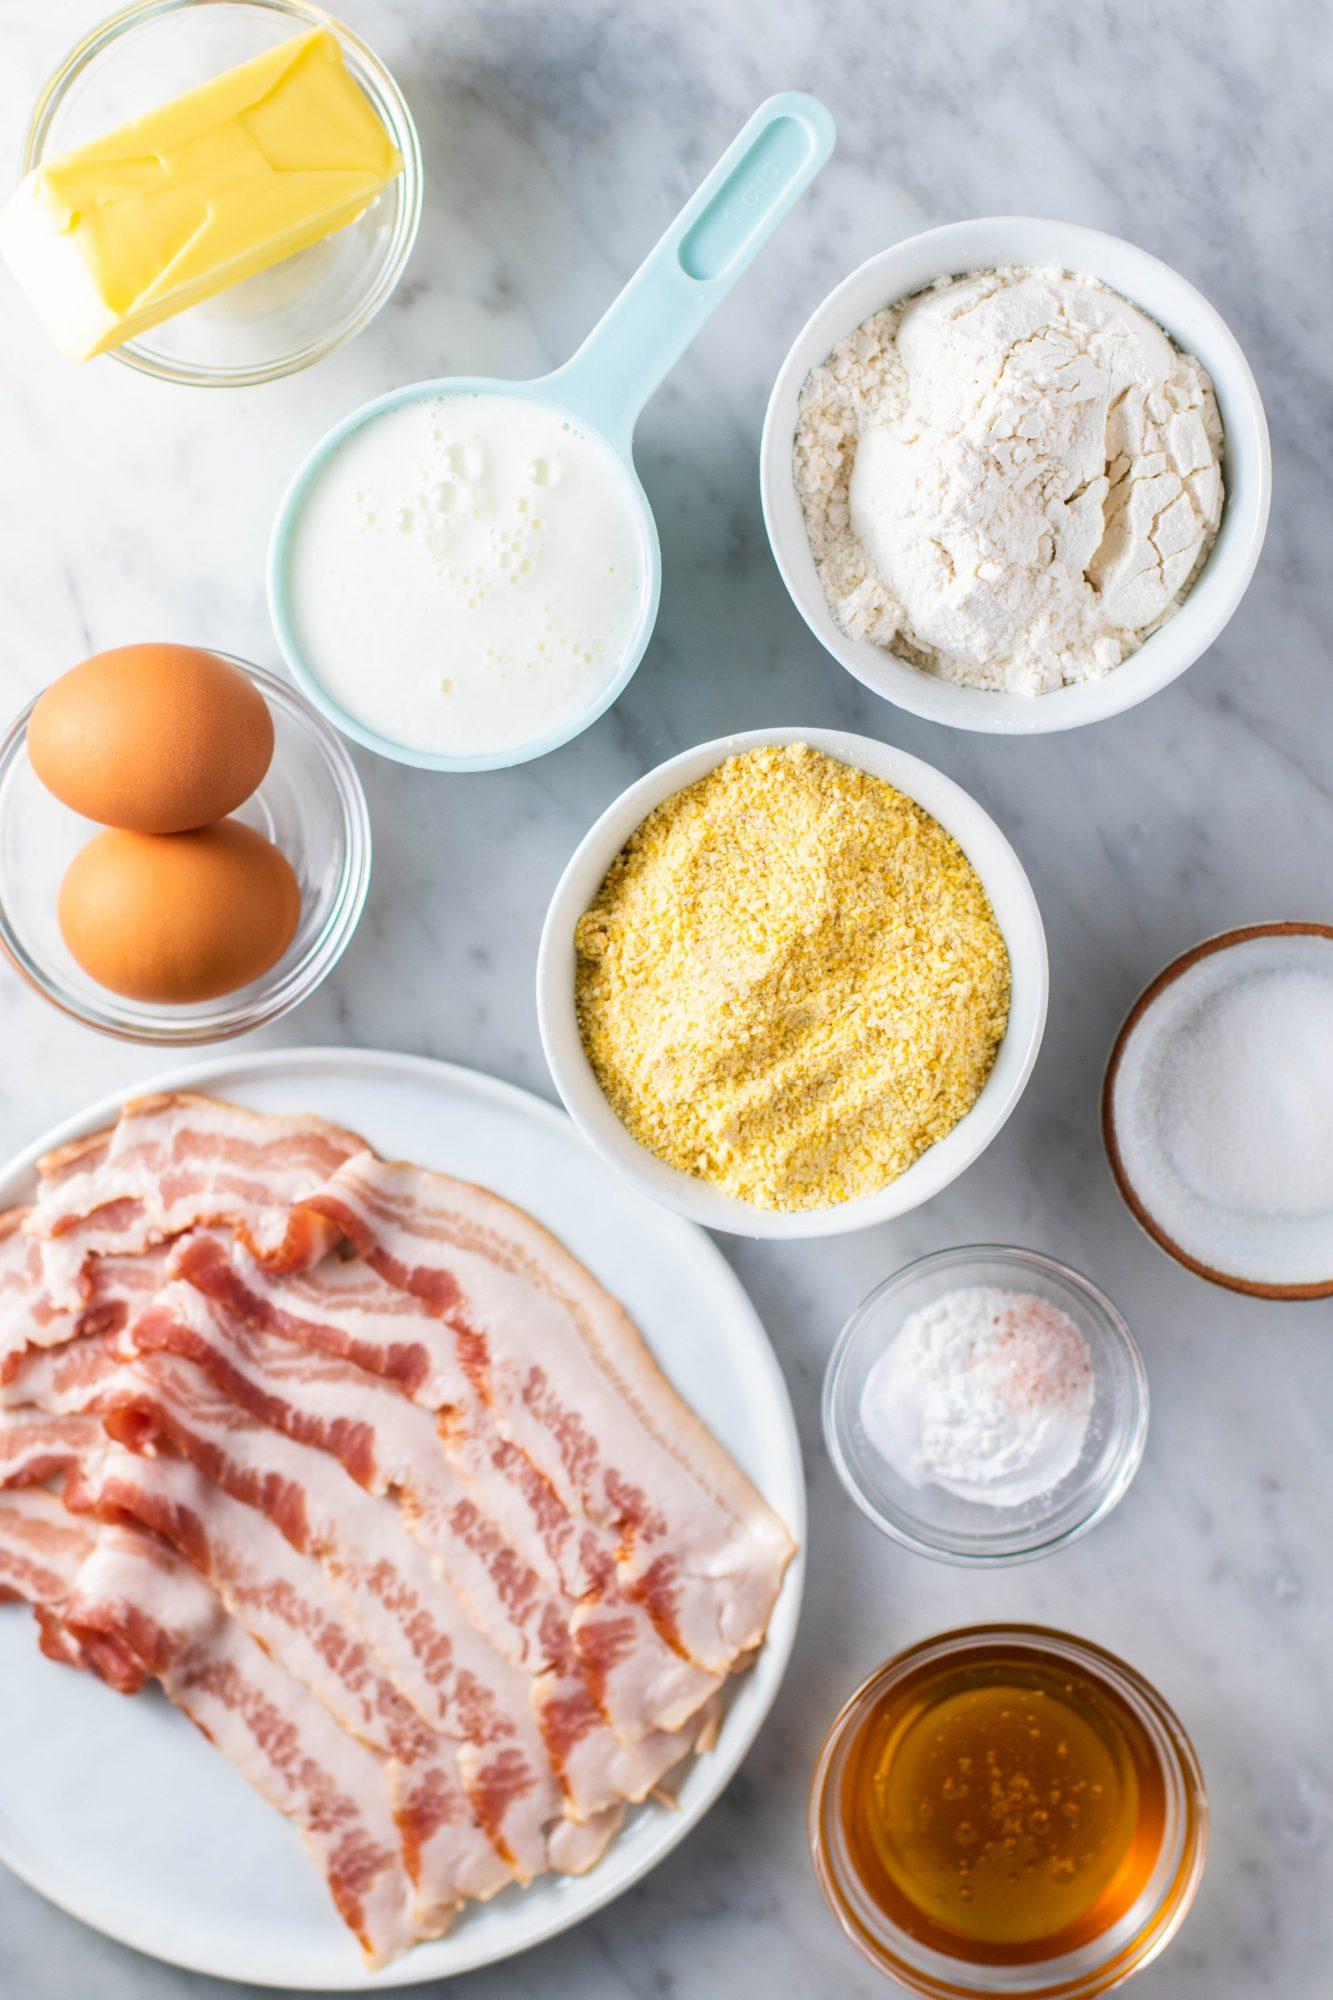 ingredients to make skillet cornbread